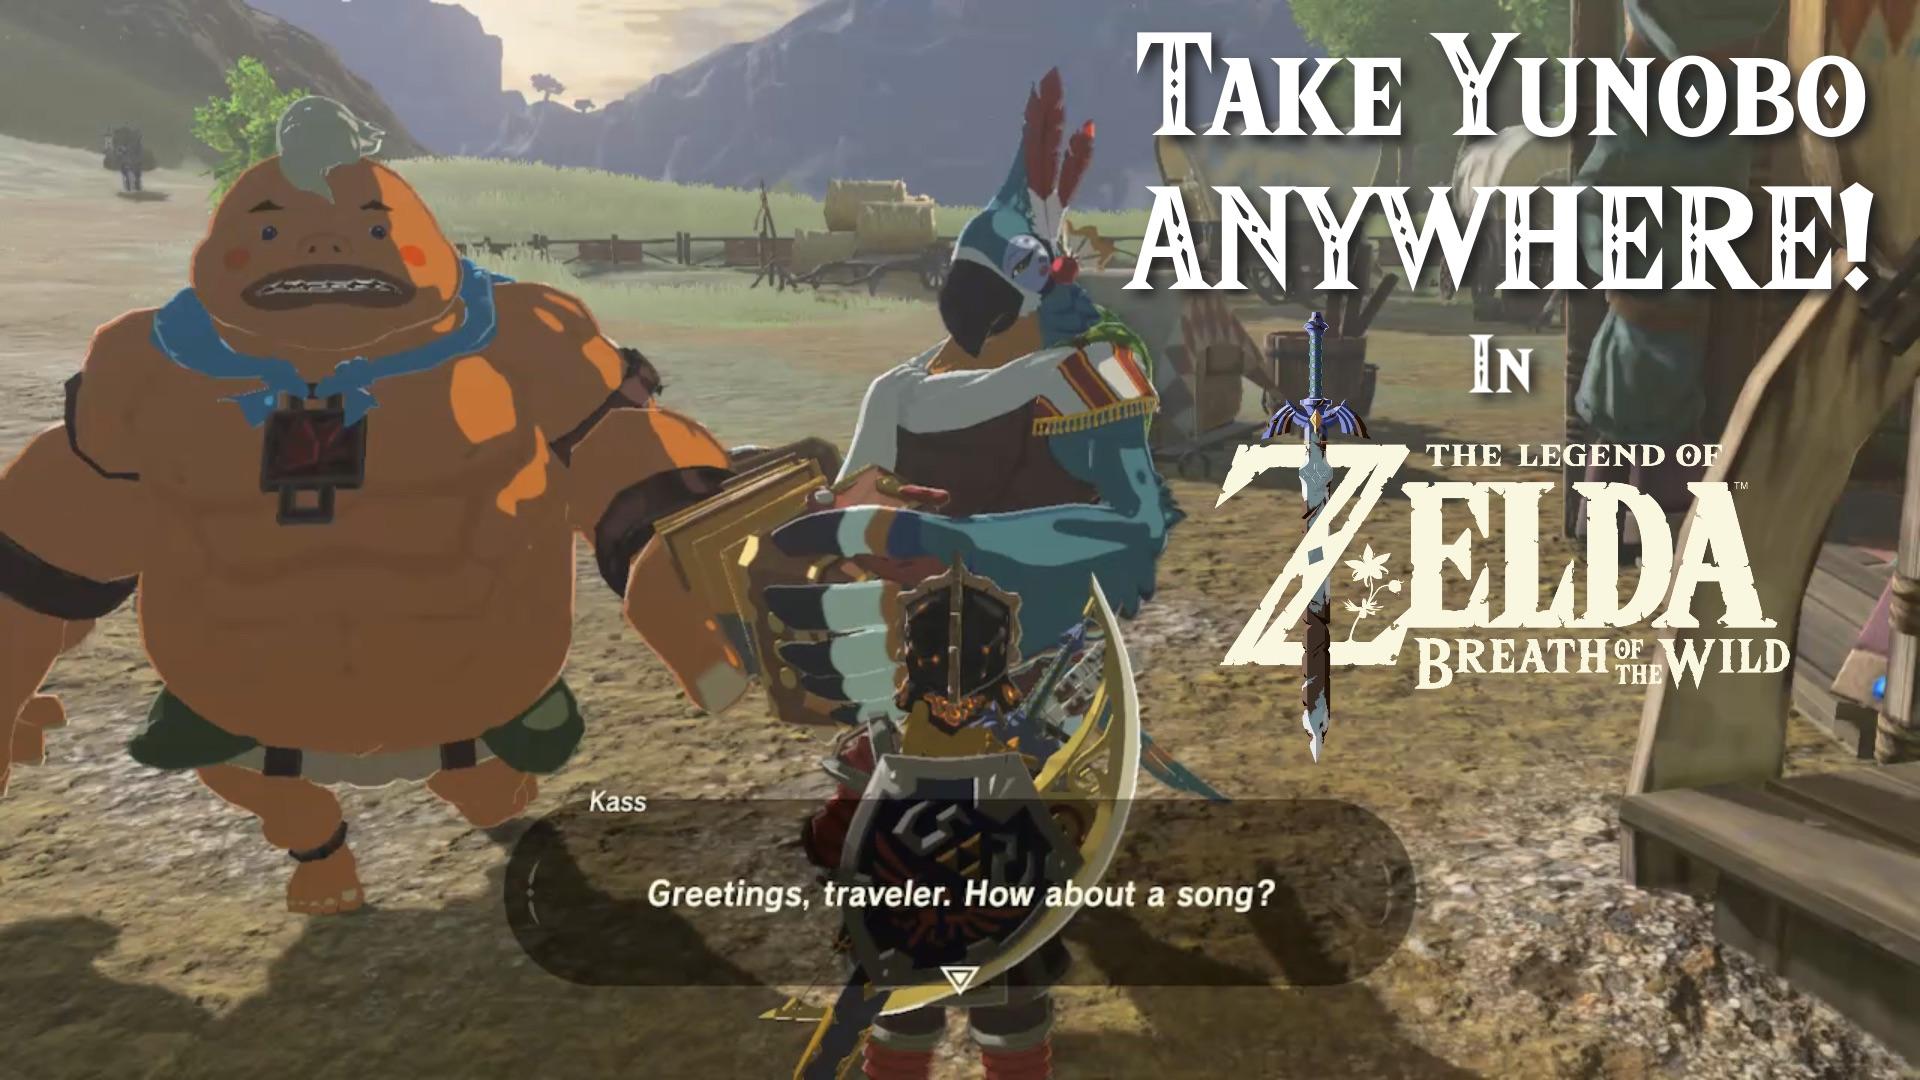 Take Yunobo Anywhere